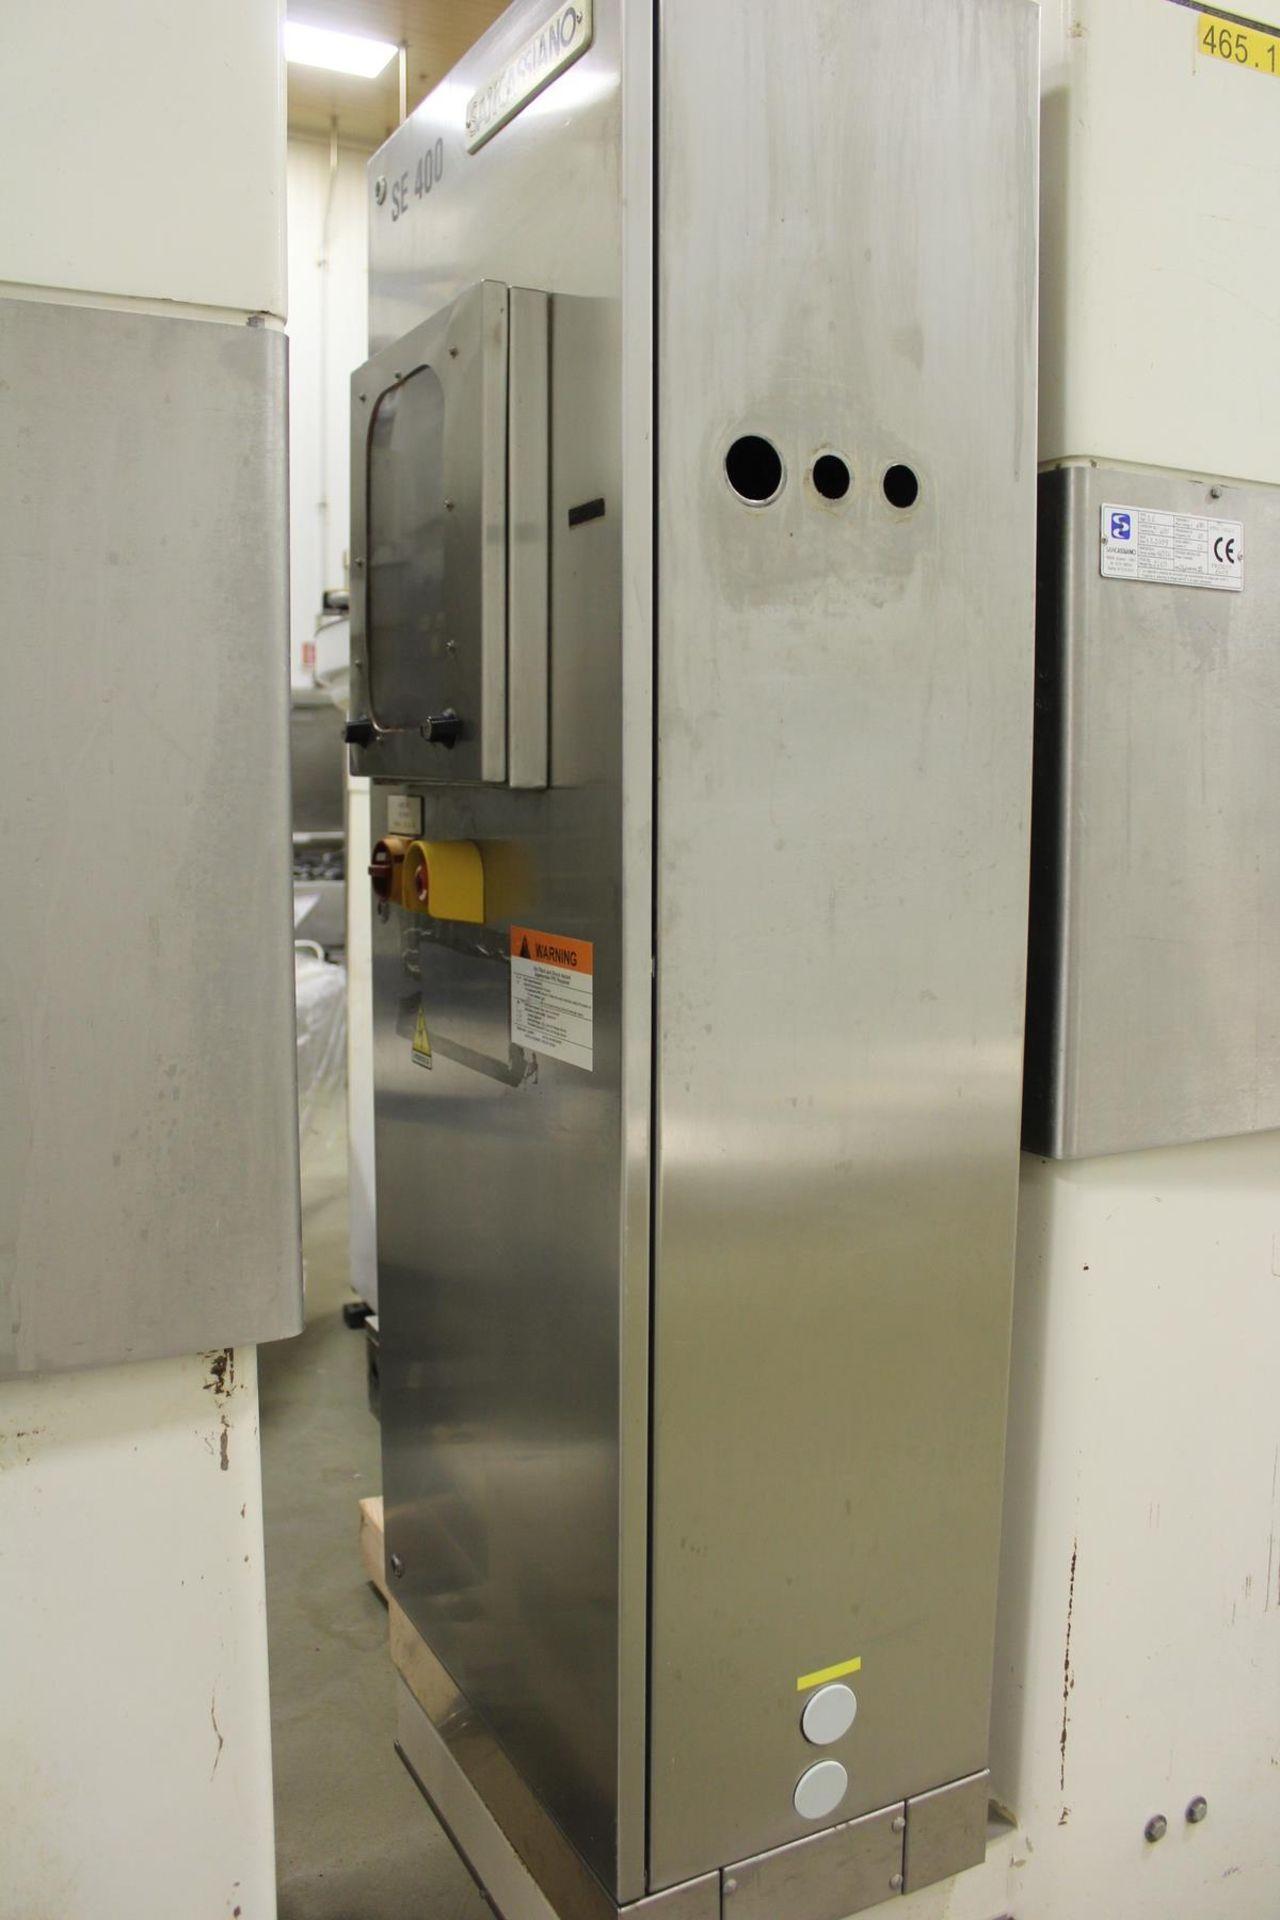 Lot 2 - 2009 San Cassiano M# SE400 Spiral Bowl Mixer, Mixing Bowl, S/N 14974, 400/500 Kg. C | Rig Fee: $1185